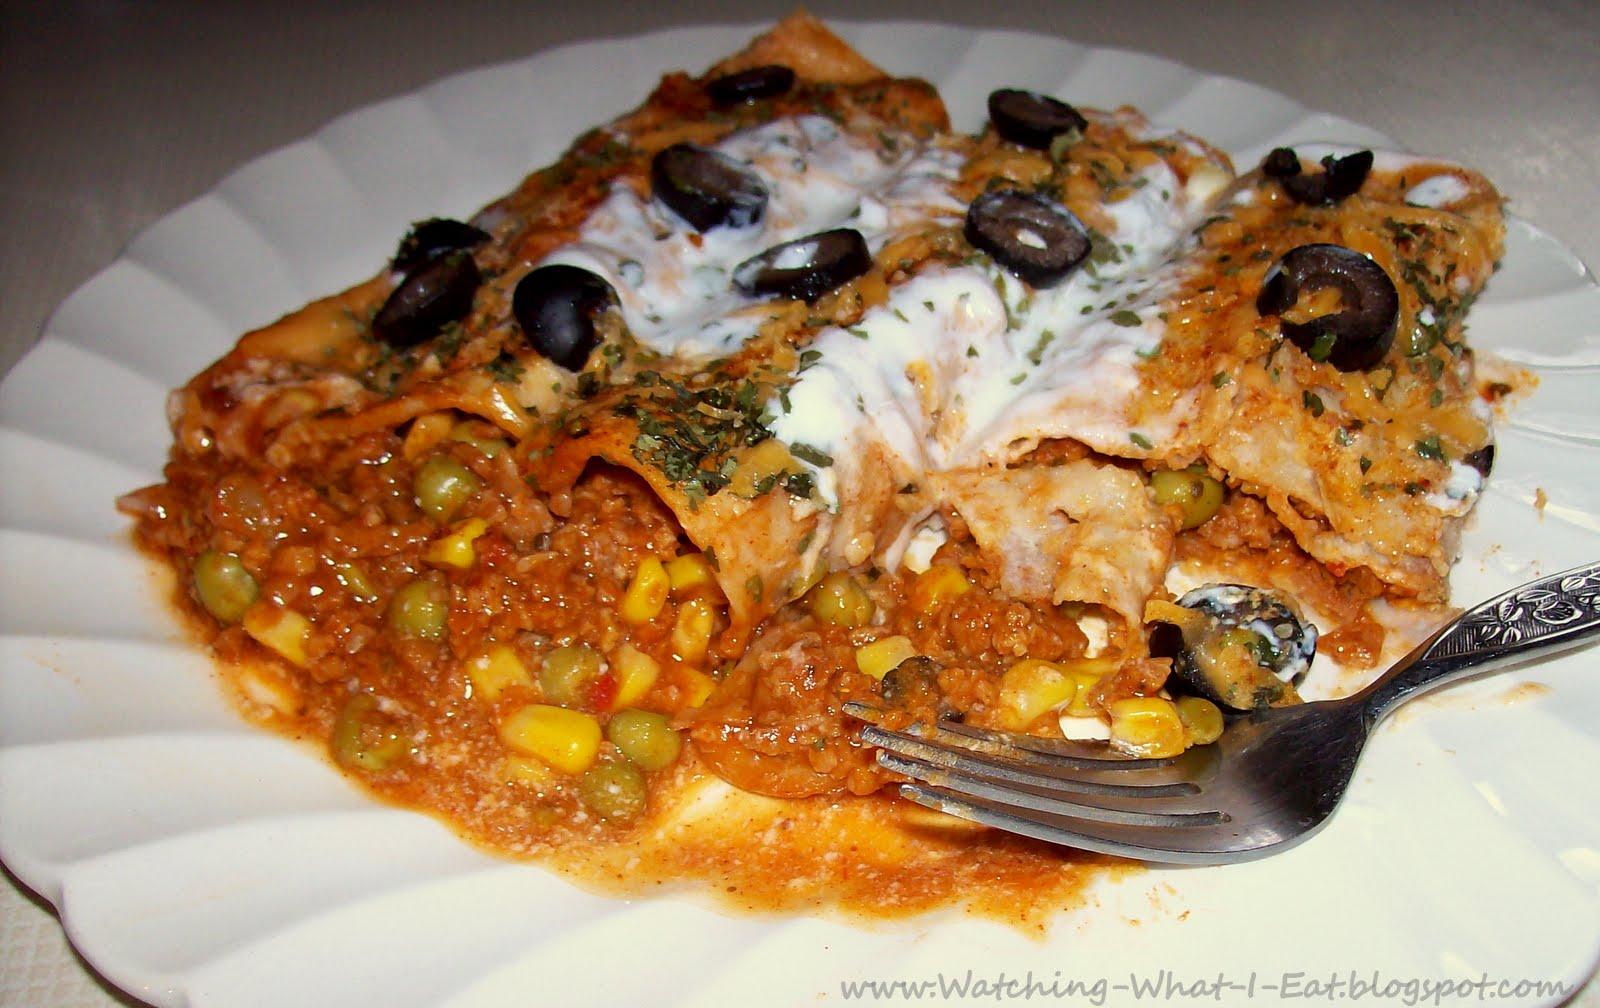 Vegetarian Enchiladas with TVP